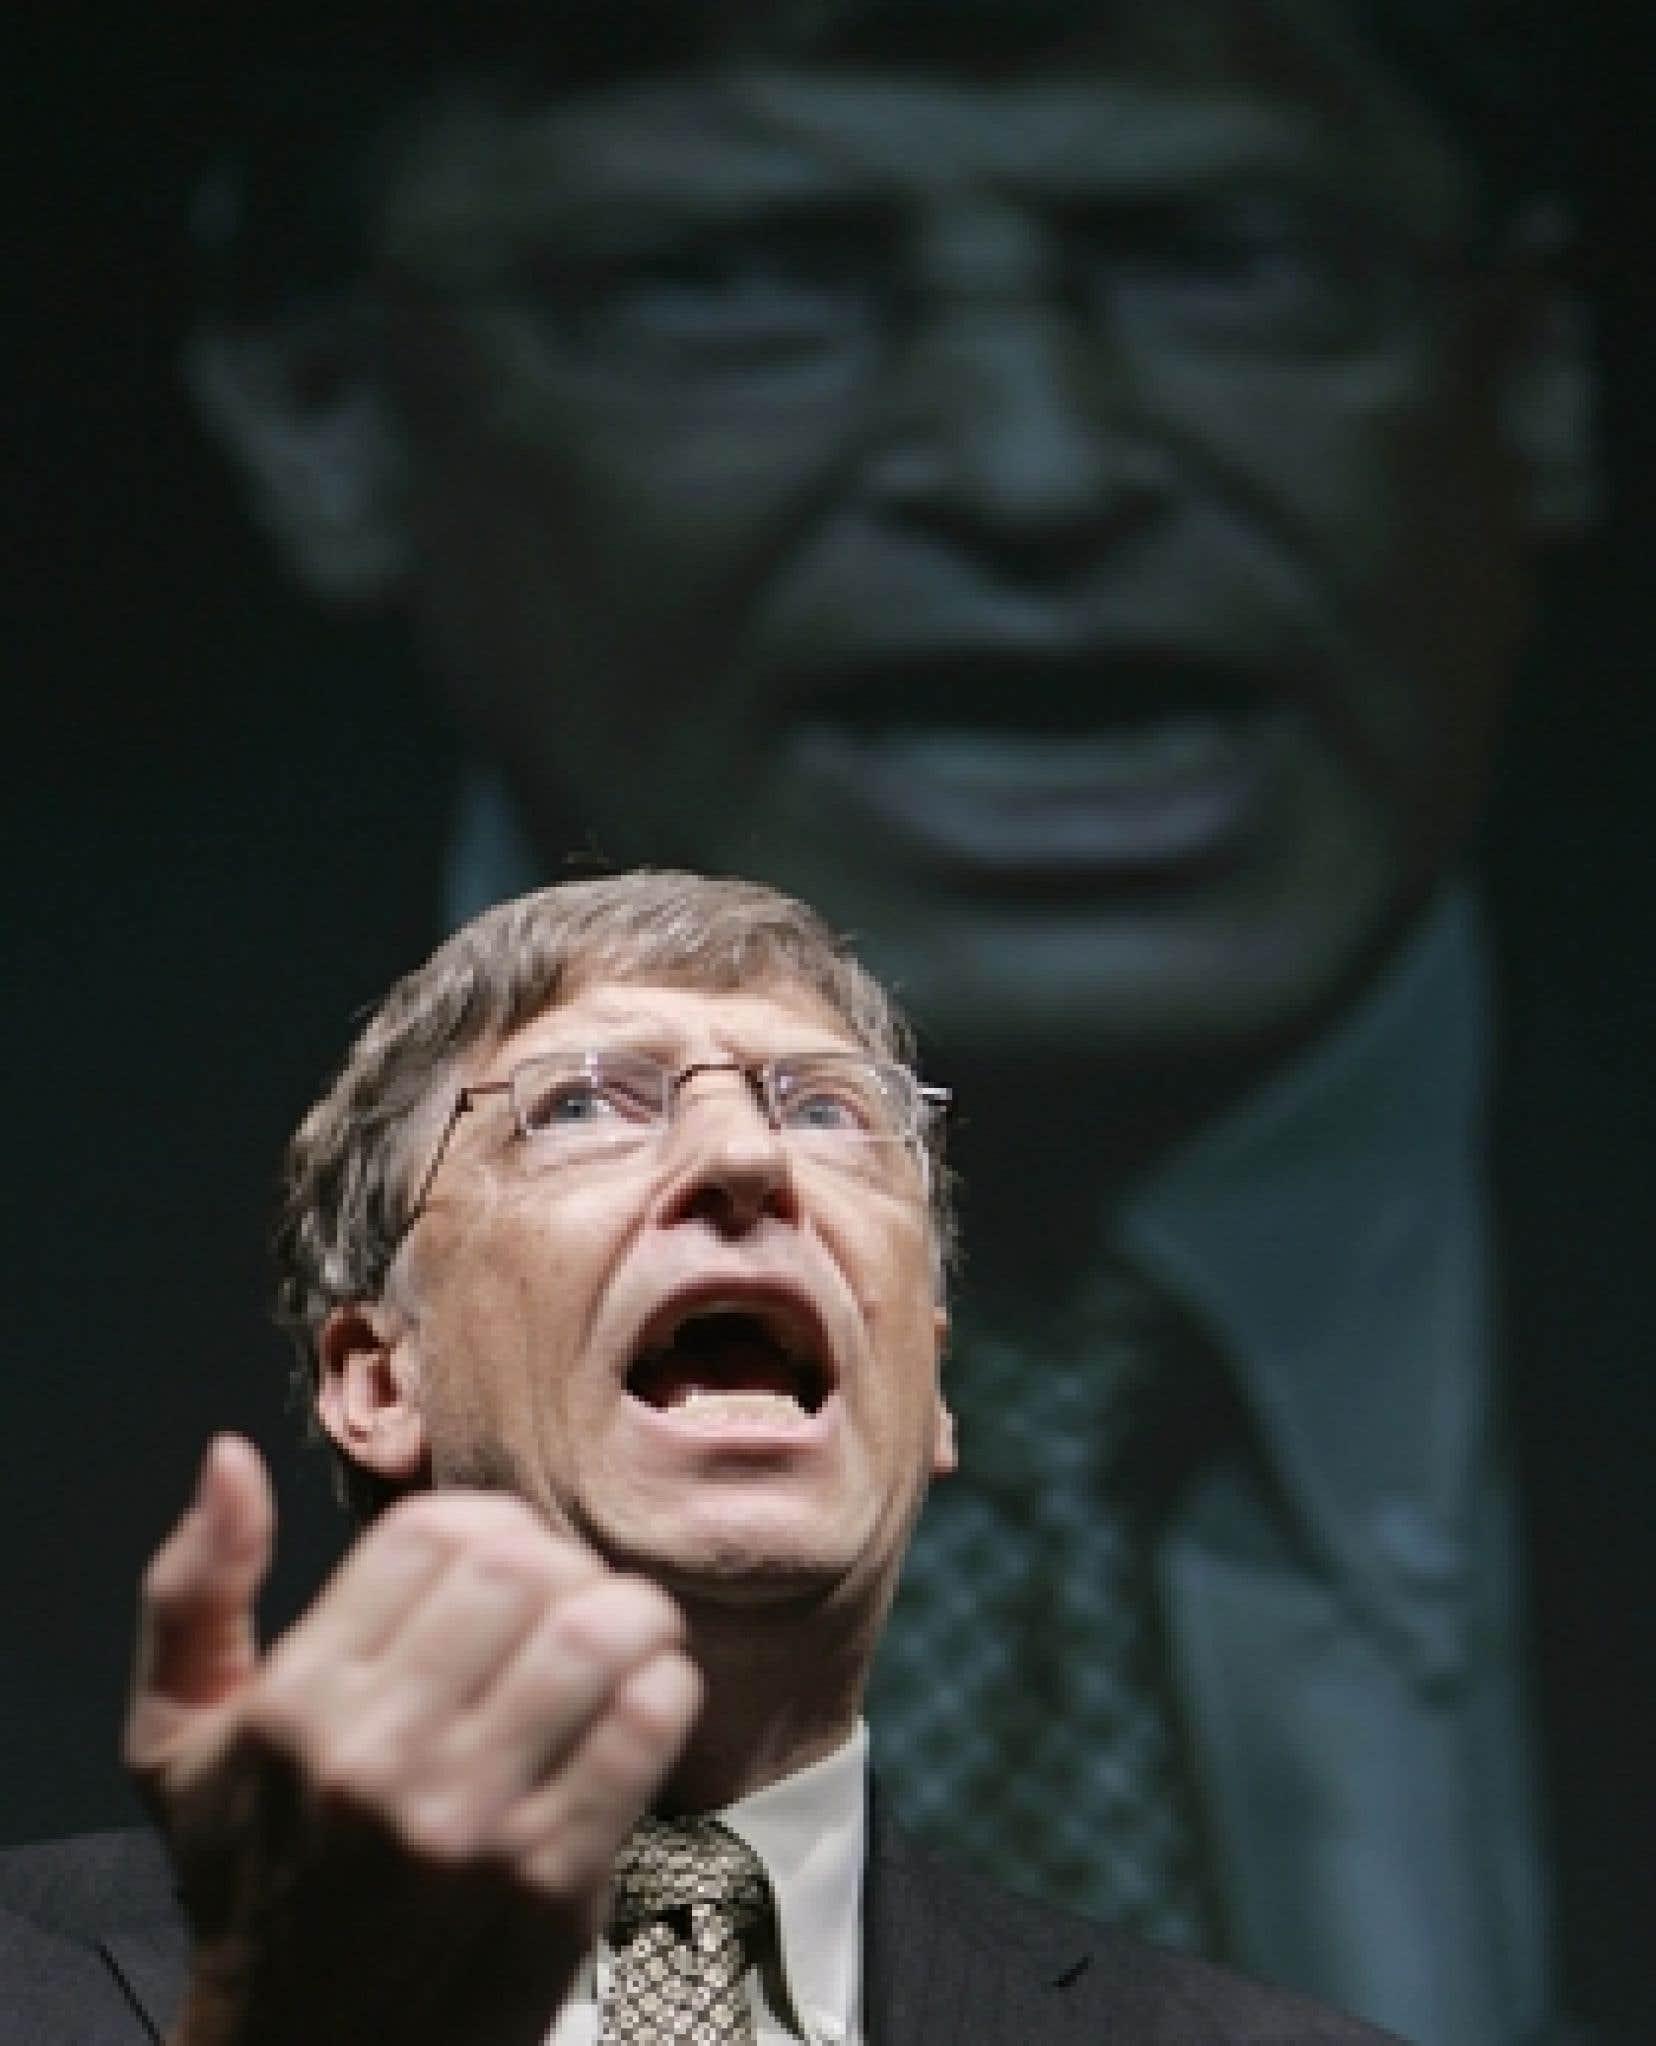 Bill Gates, fondateur de Microsoft, hier